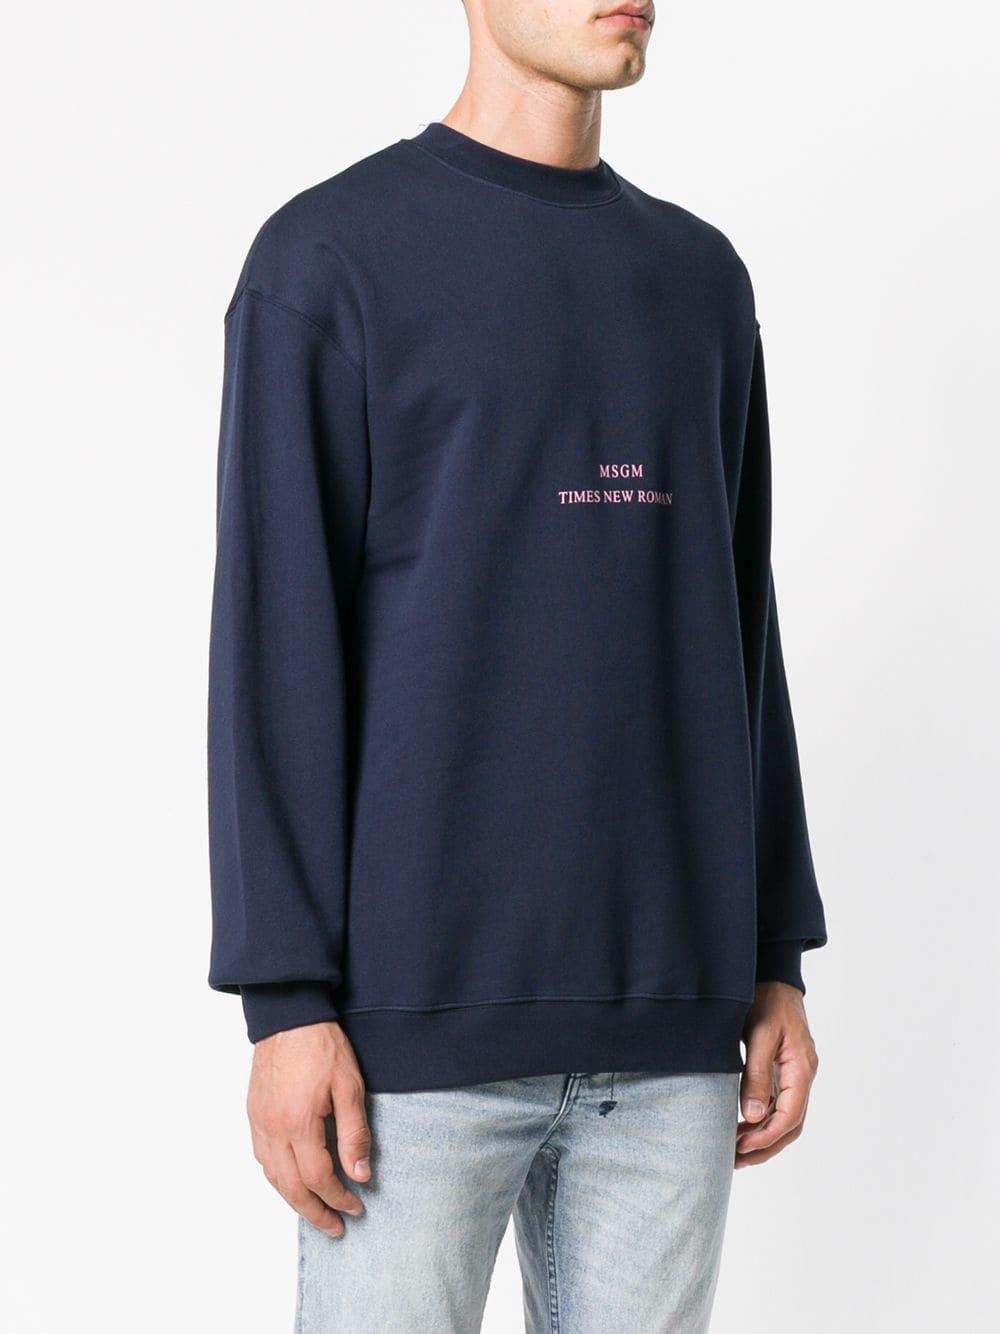 MSGM Logo Print Sweatshirt in Blue for Men